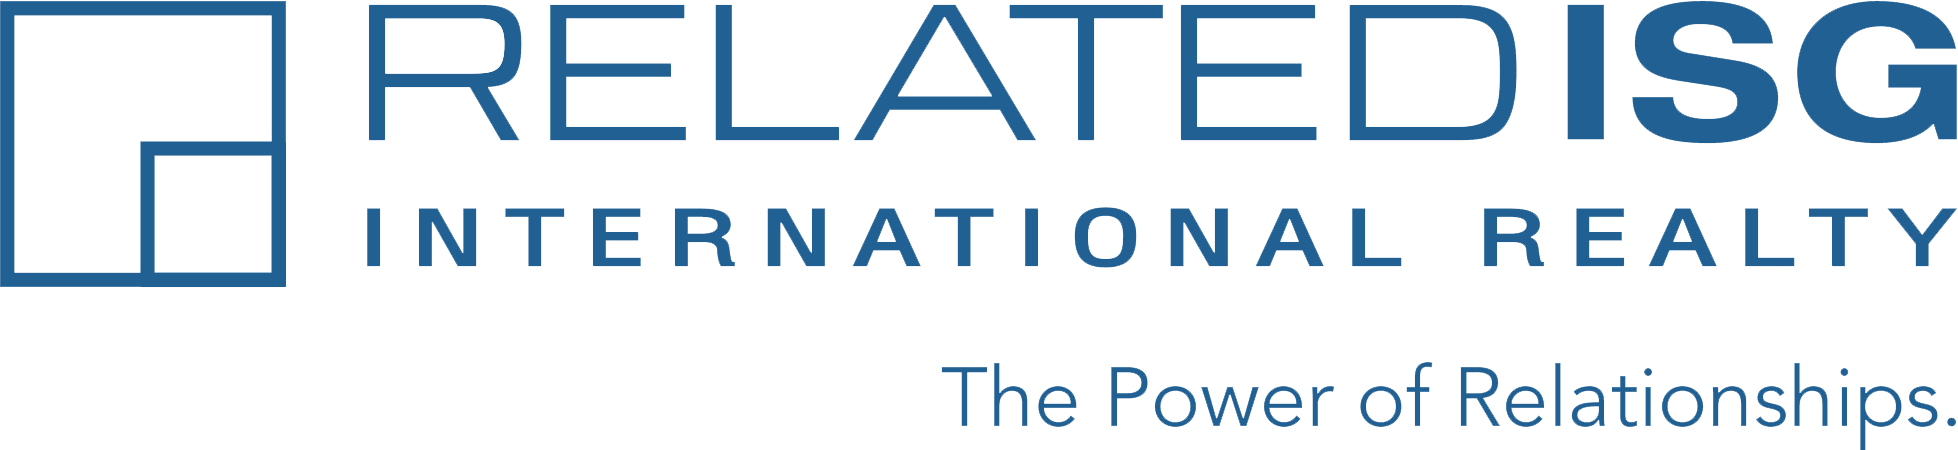 RelatedISG-Transparent-logo.png